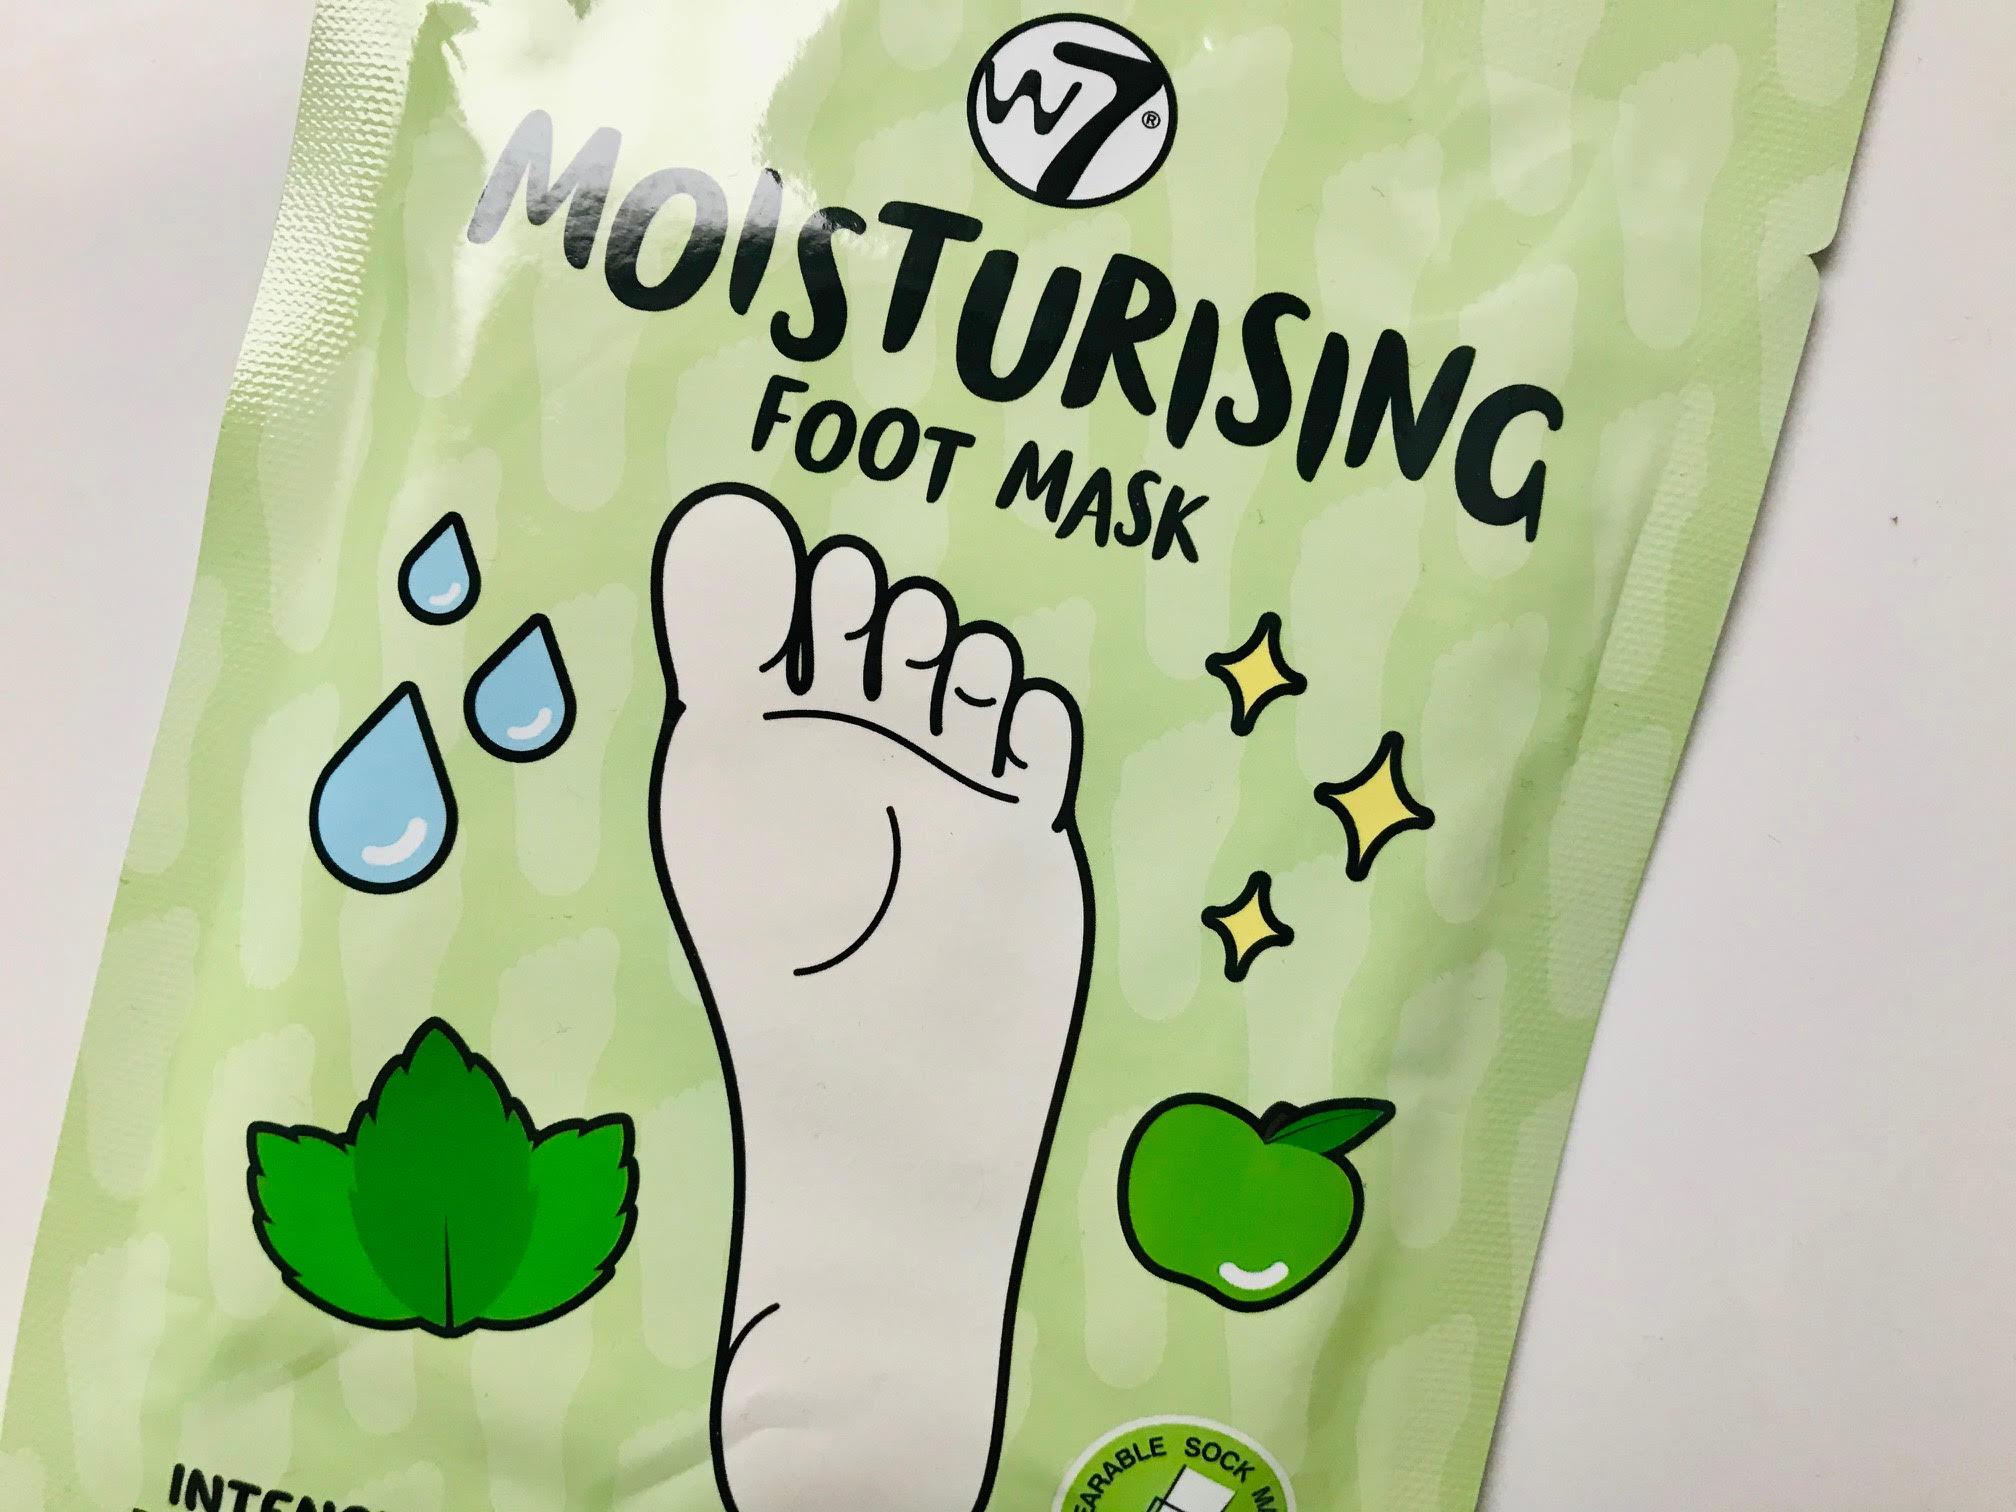 W7 moisturizing footpack